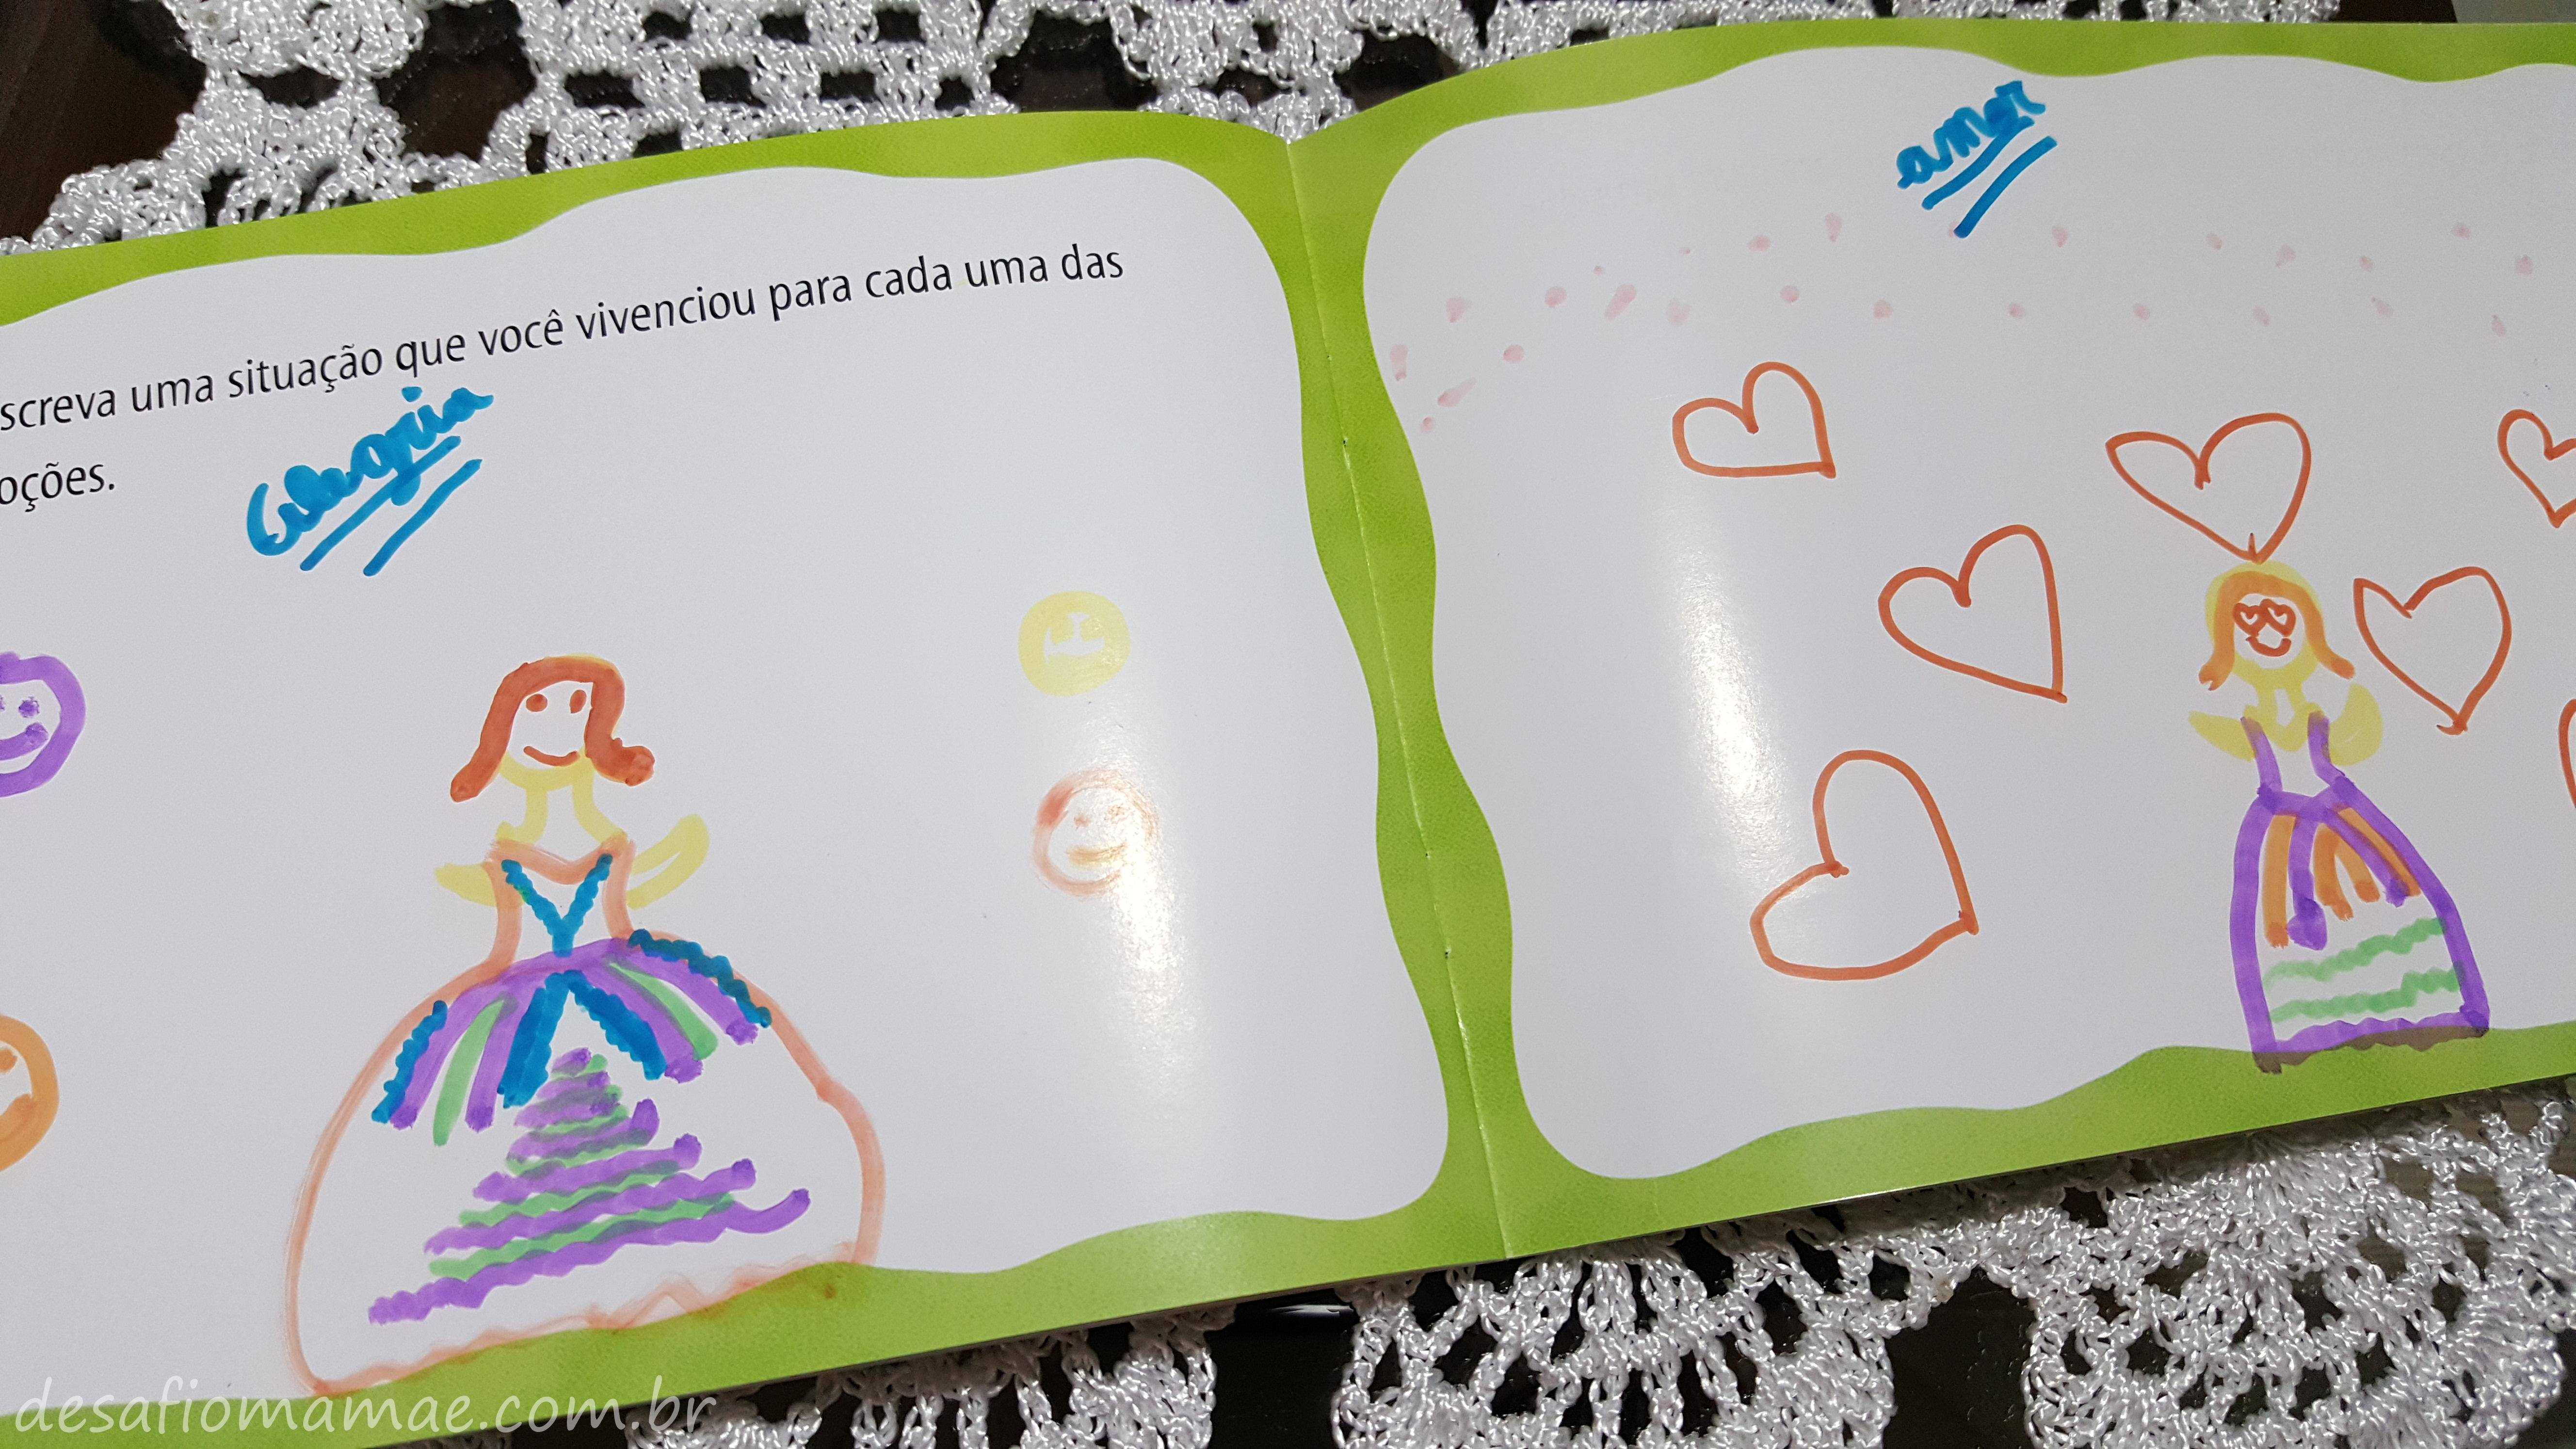 Recebidos da Sinopsys Editora